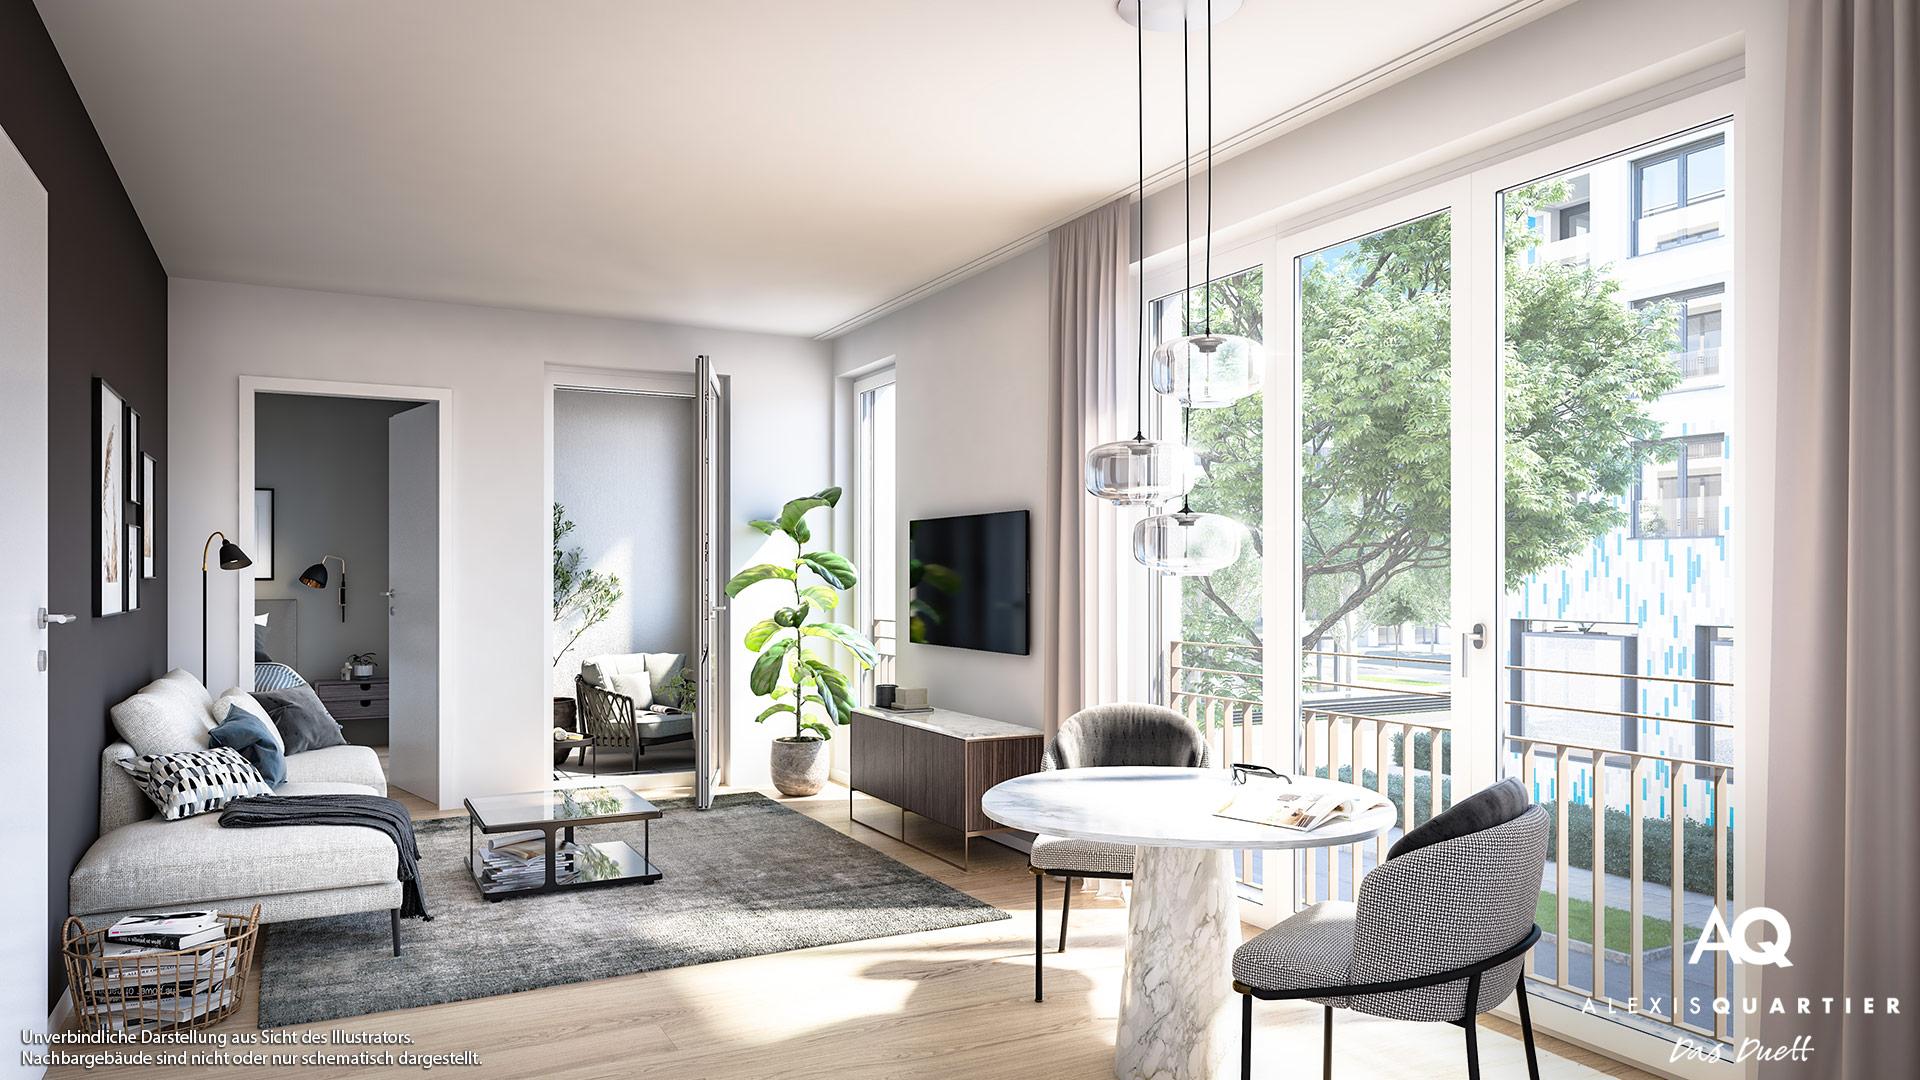 Immobilie Alexisquartier - Das Duett - Illustration 11